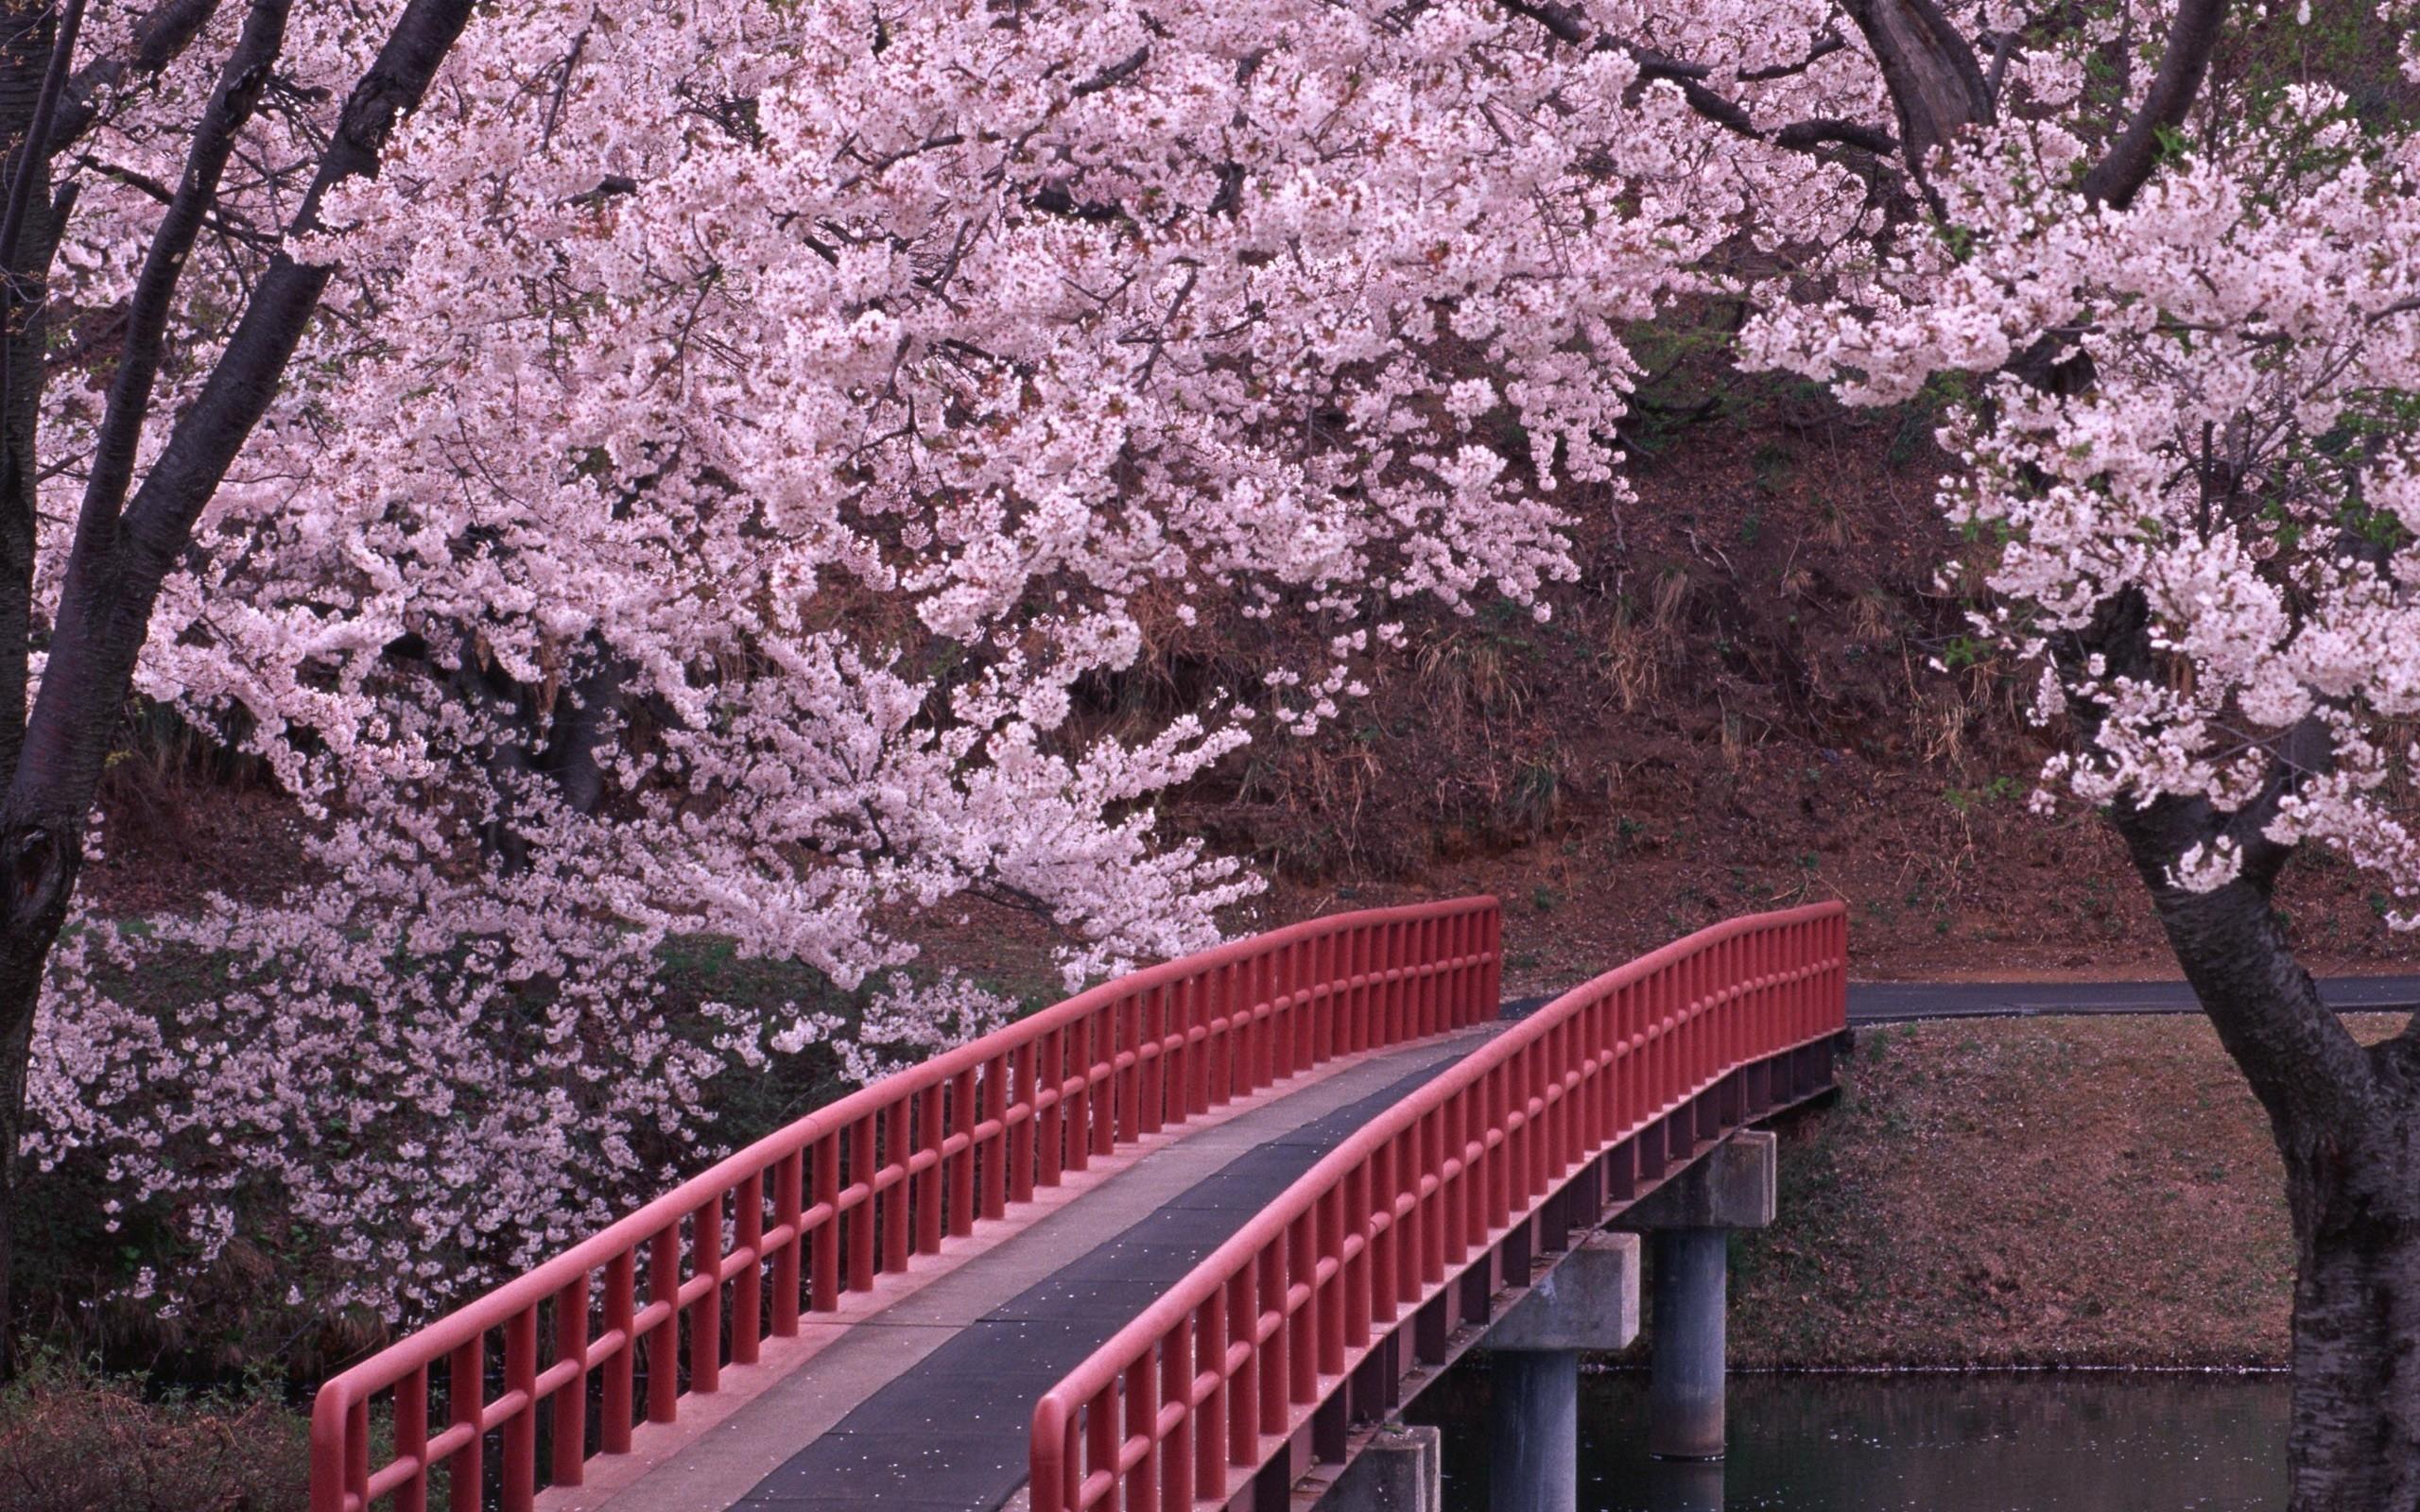 landscapes cherry blossoms flowers bridges fresh new hd wallpaper